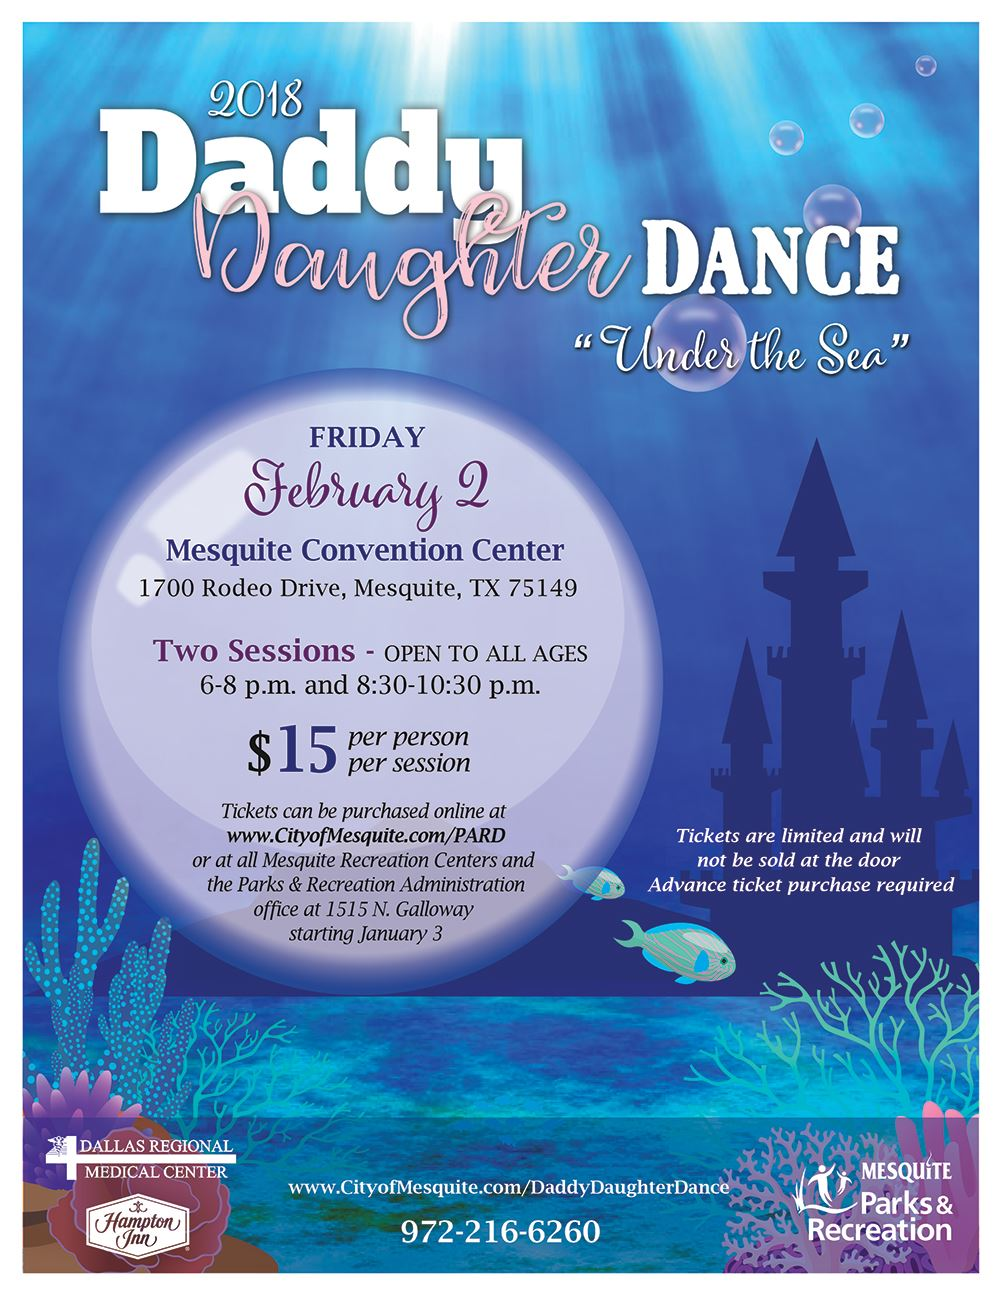 Frisco daddy daughter dance 2018 kansas